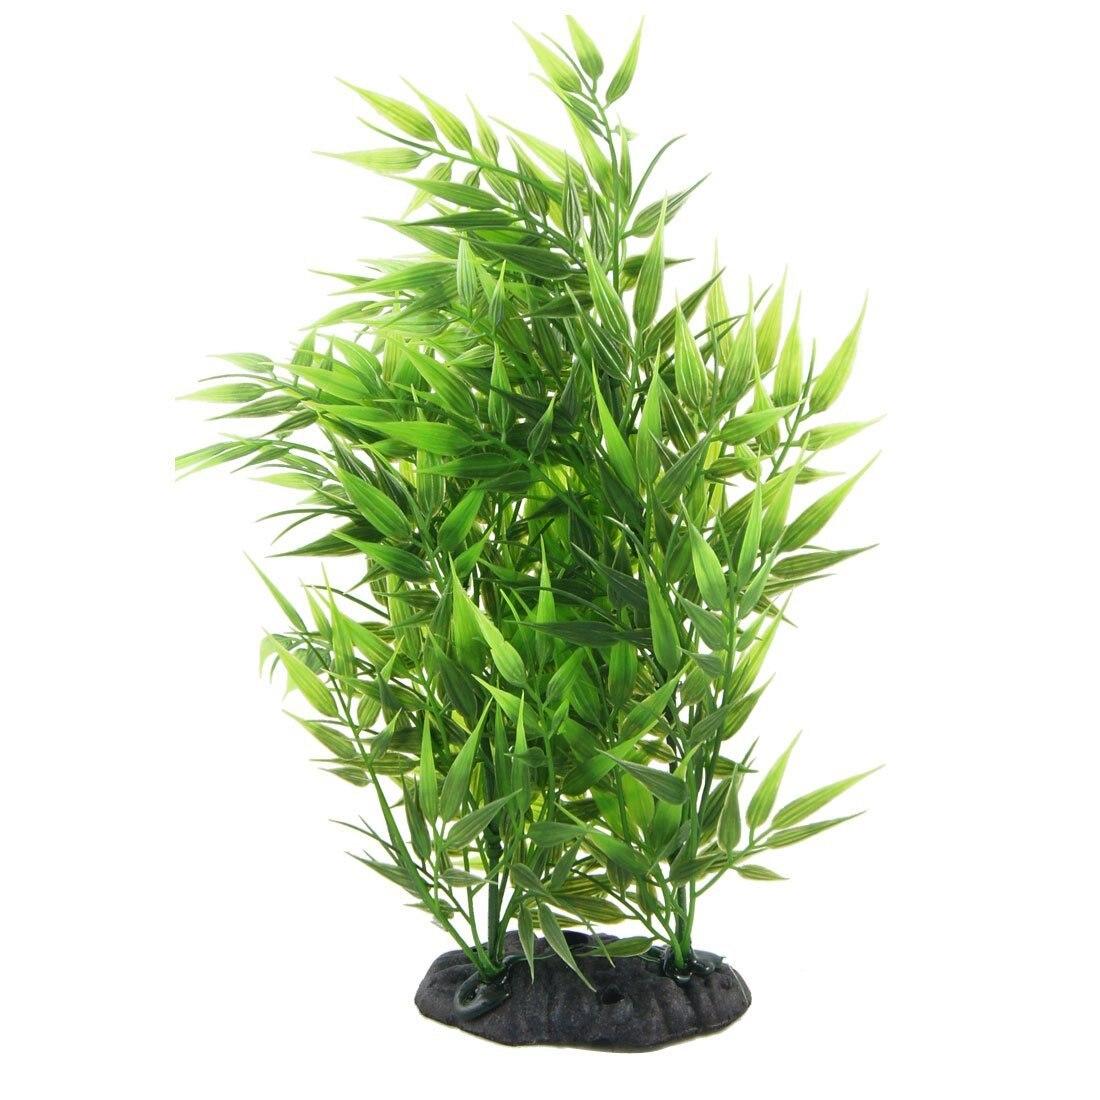 Green Bamboo Leaves Shaped Decorative Artificial Grass For Aquarium Fish Tank